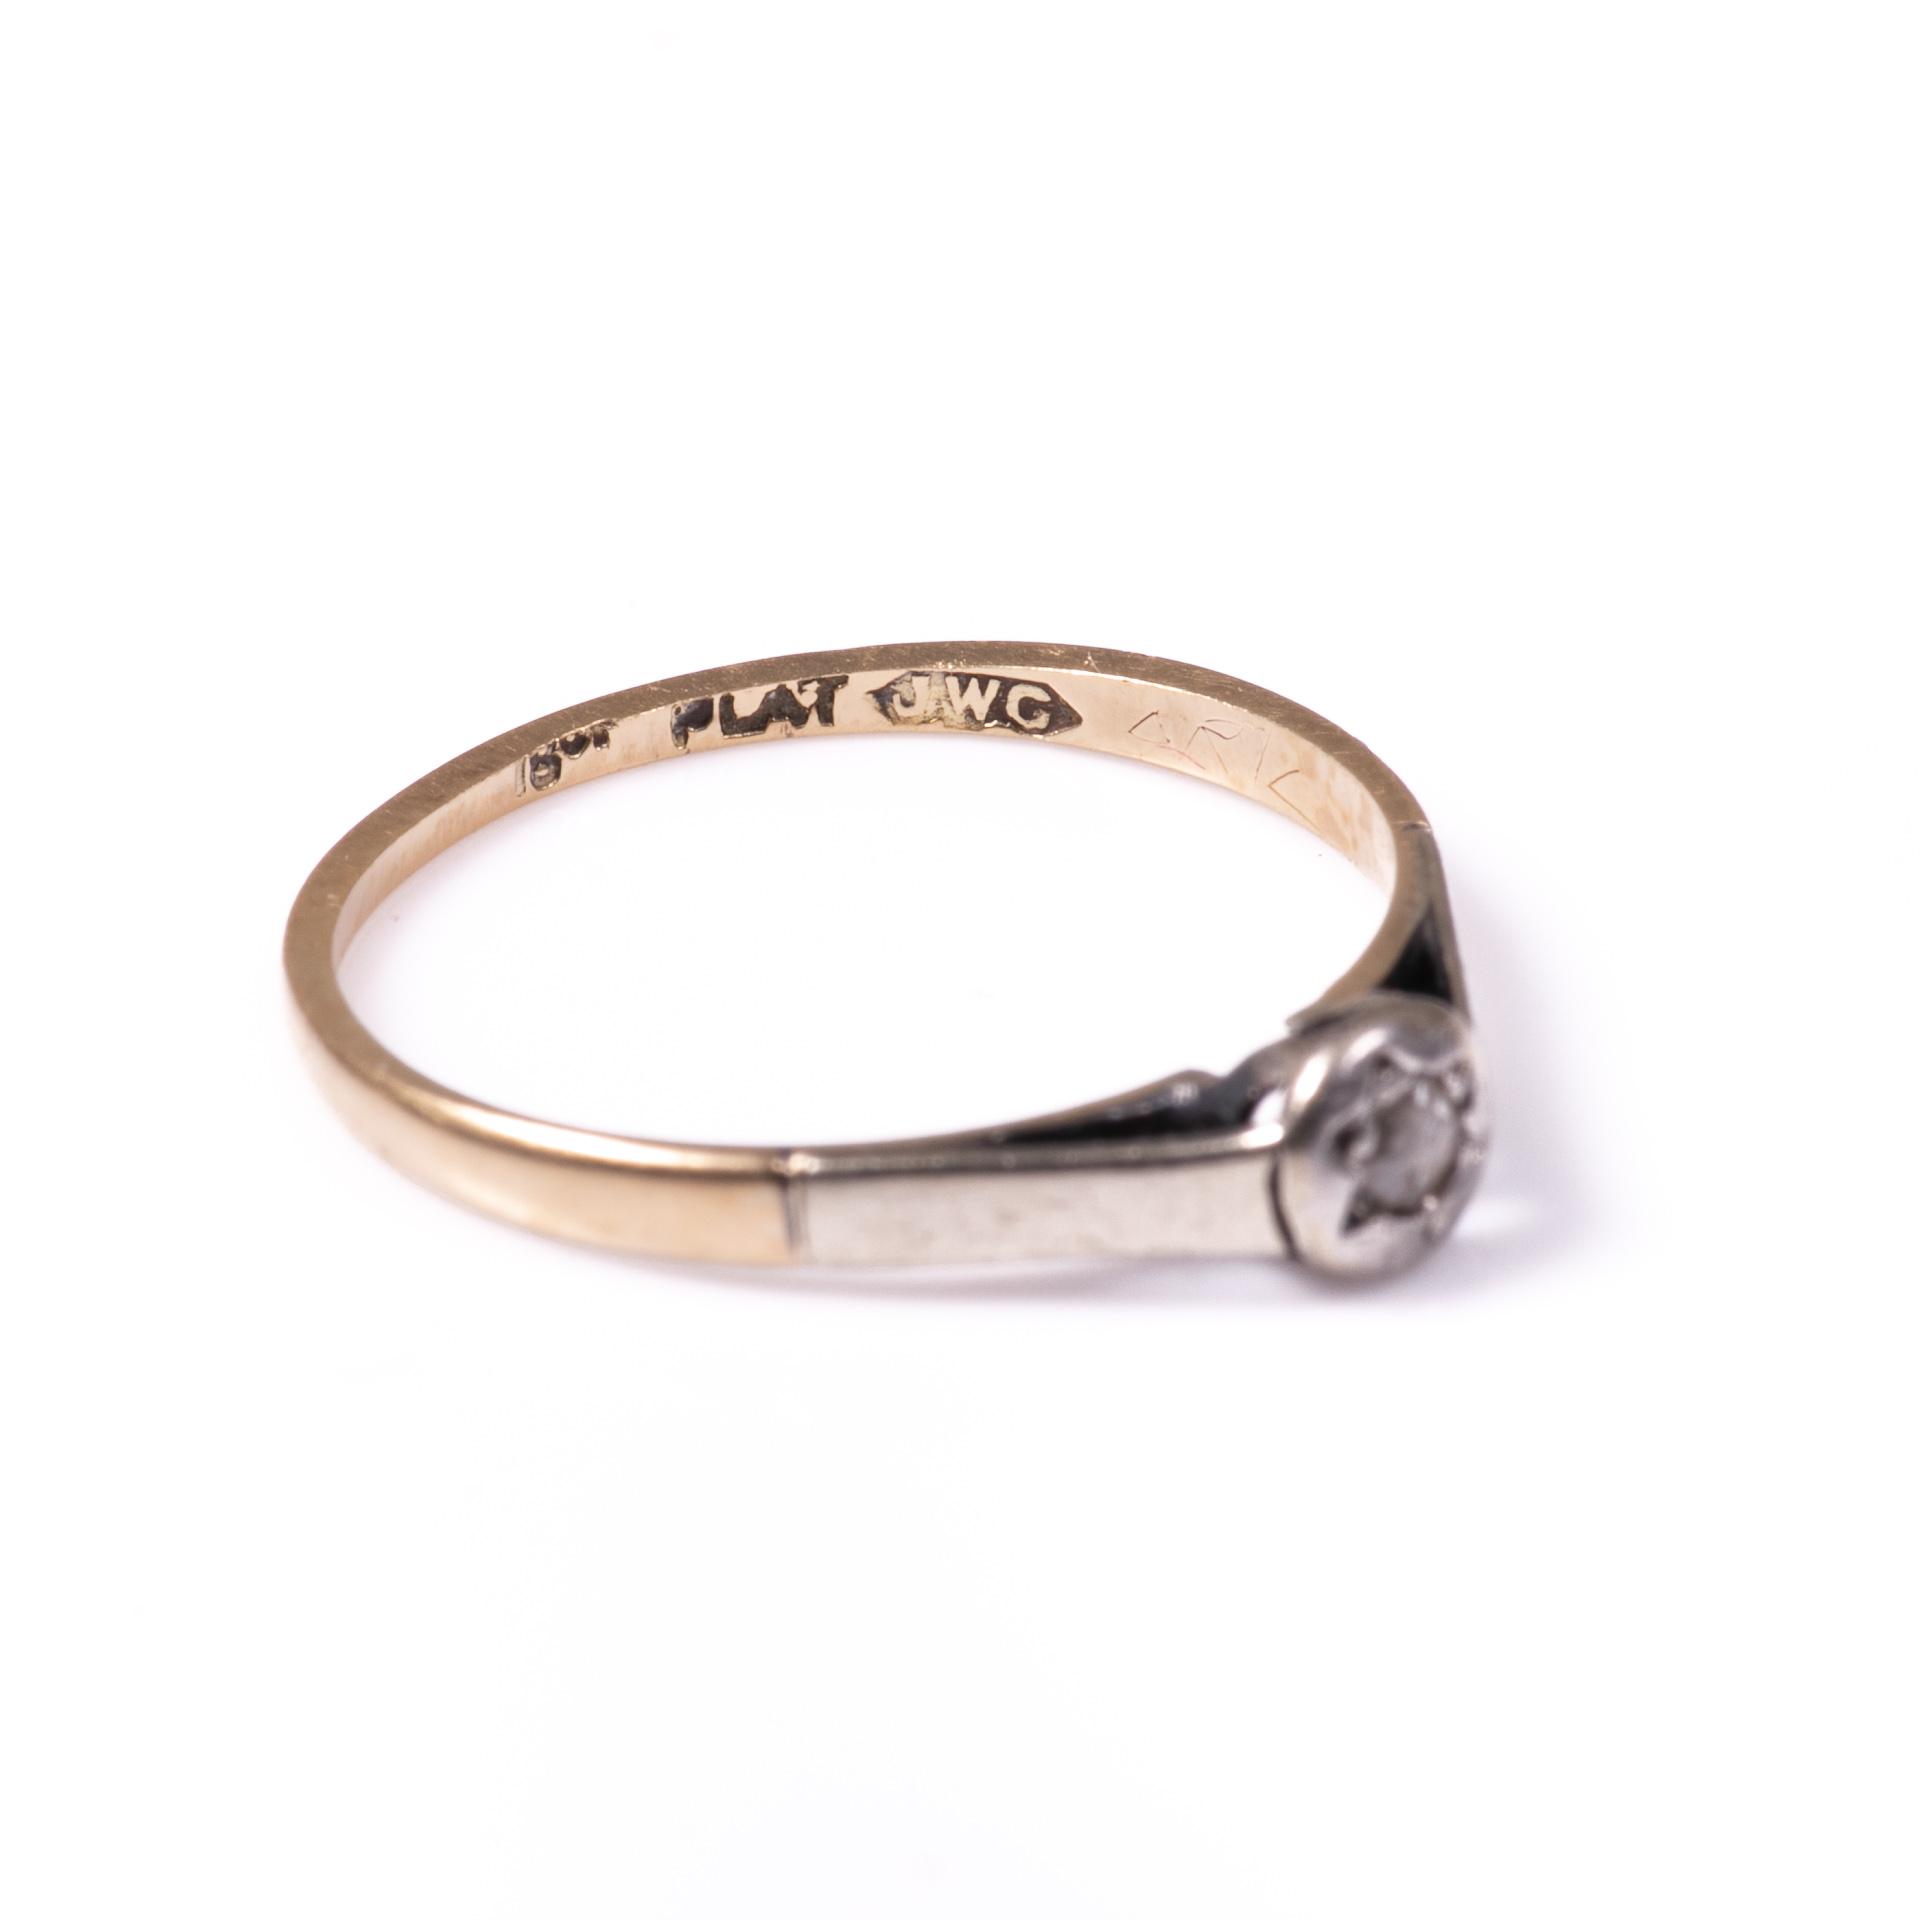 18ct Gold & Platinum Rose Cut Diamond Ring - Image 7 of 7